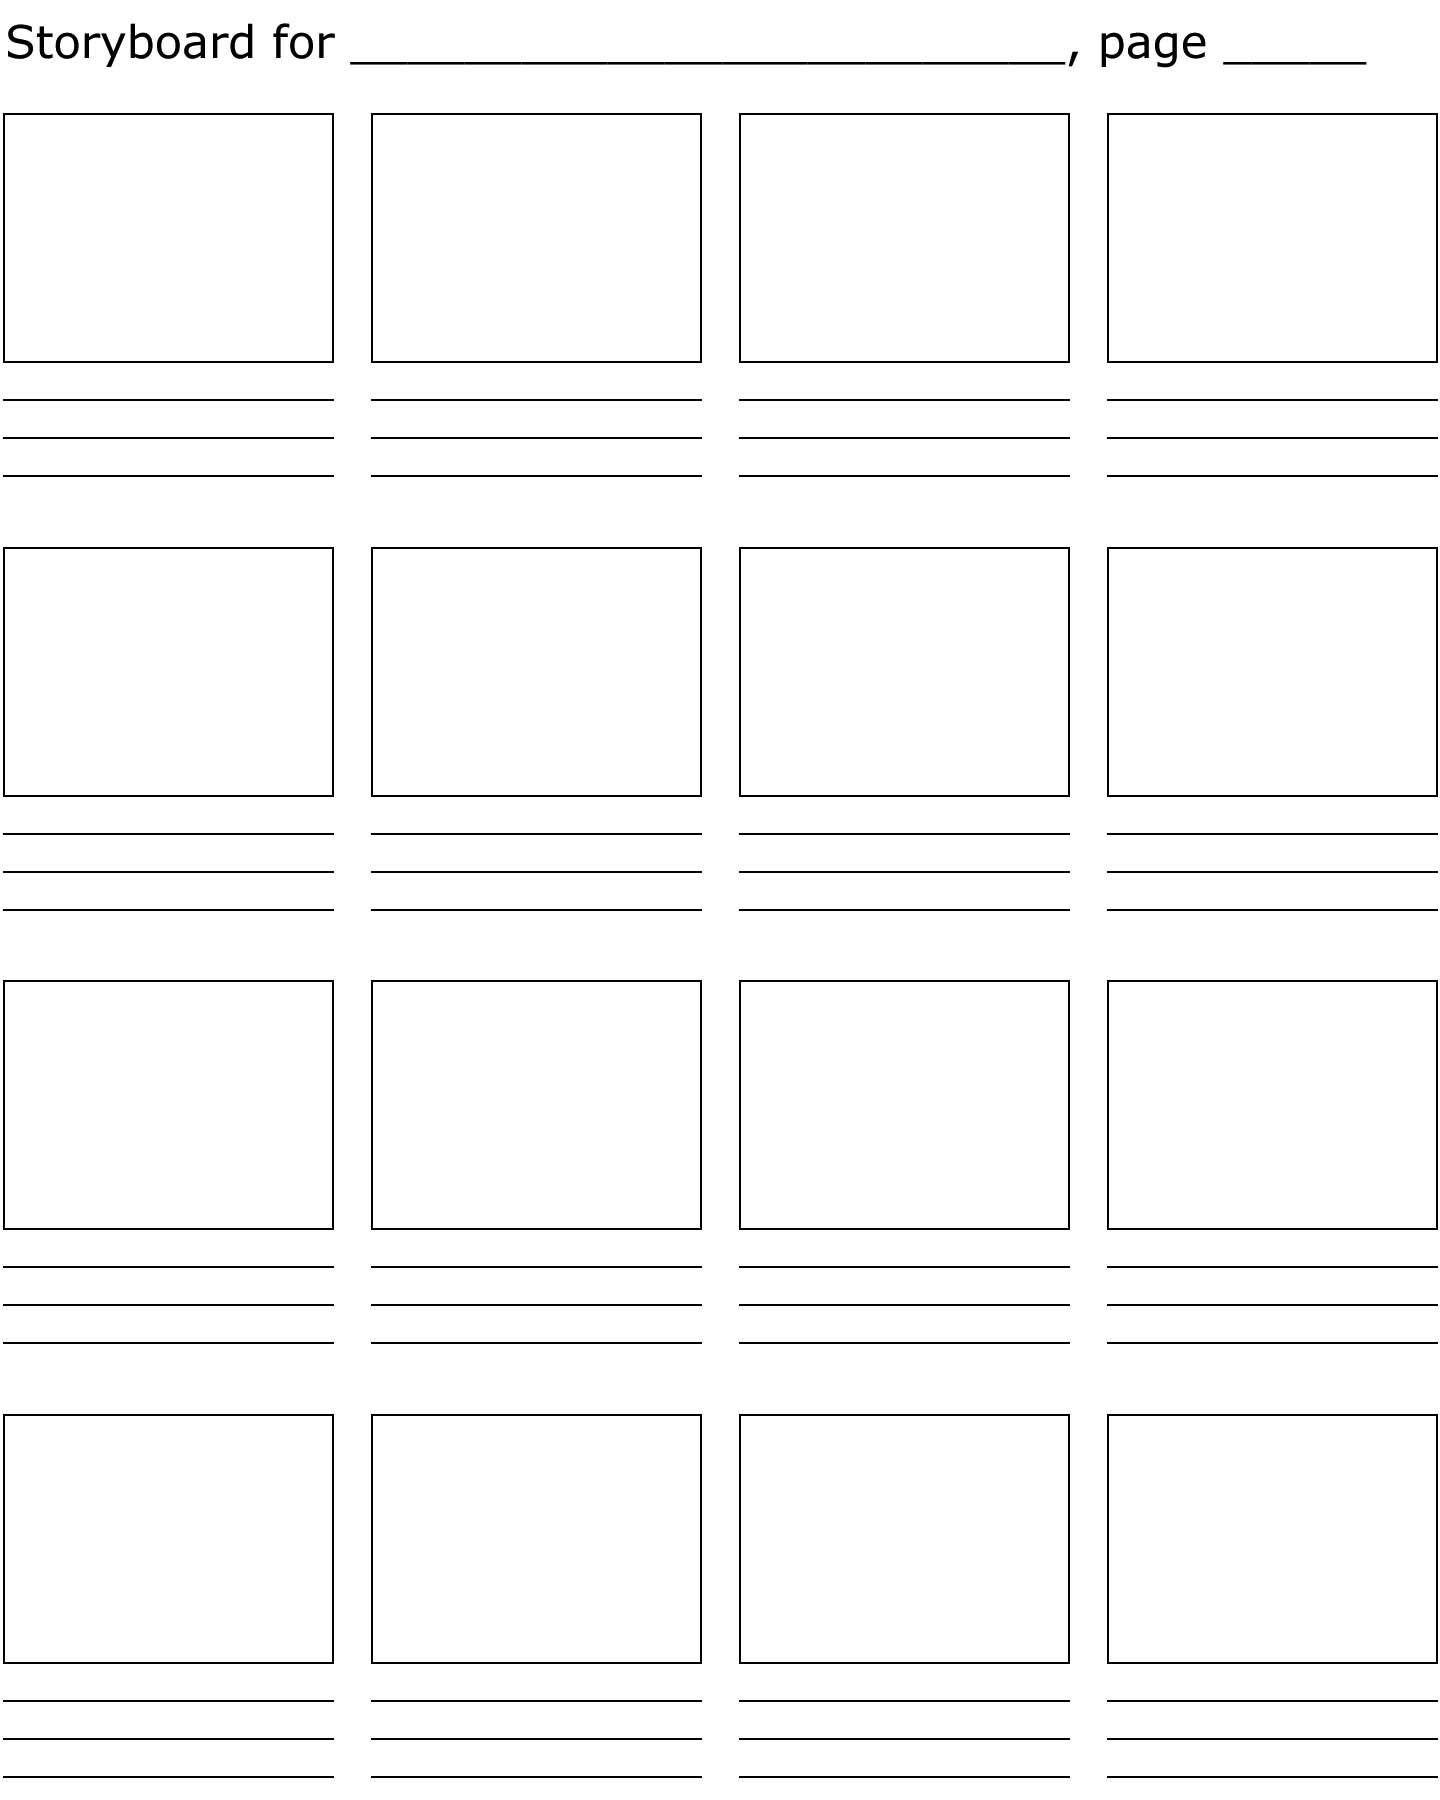 Film Storyboard Template Pdf Best 25 Storyboard Template Ideas On Pinterest